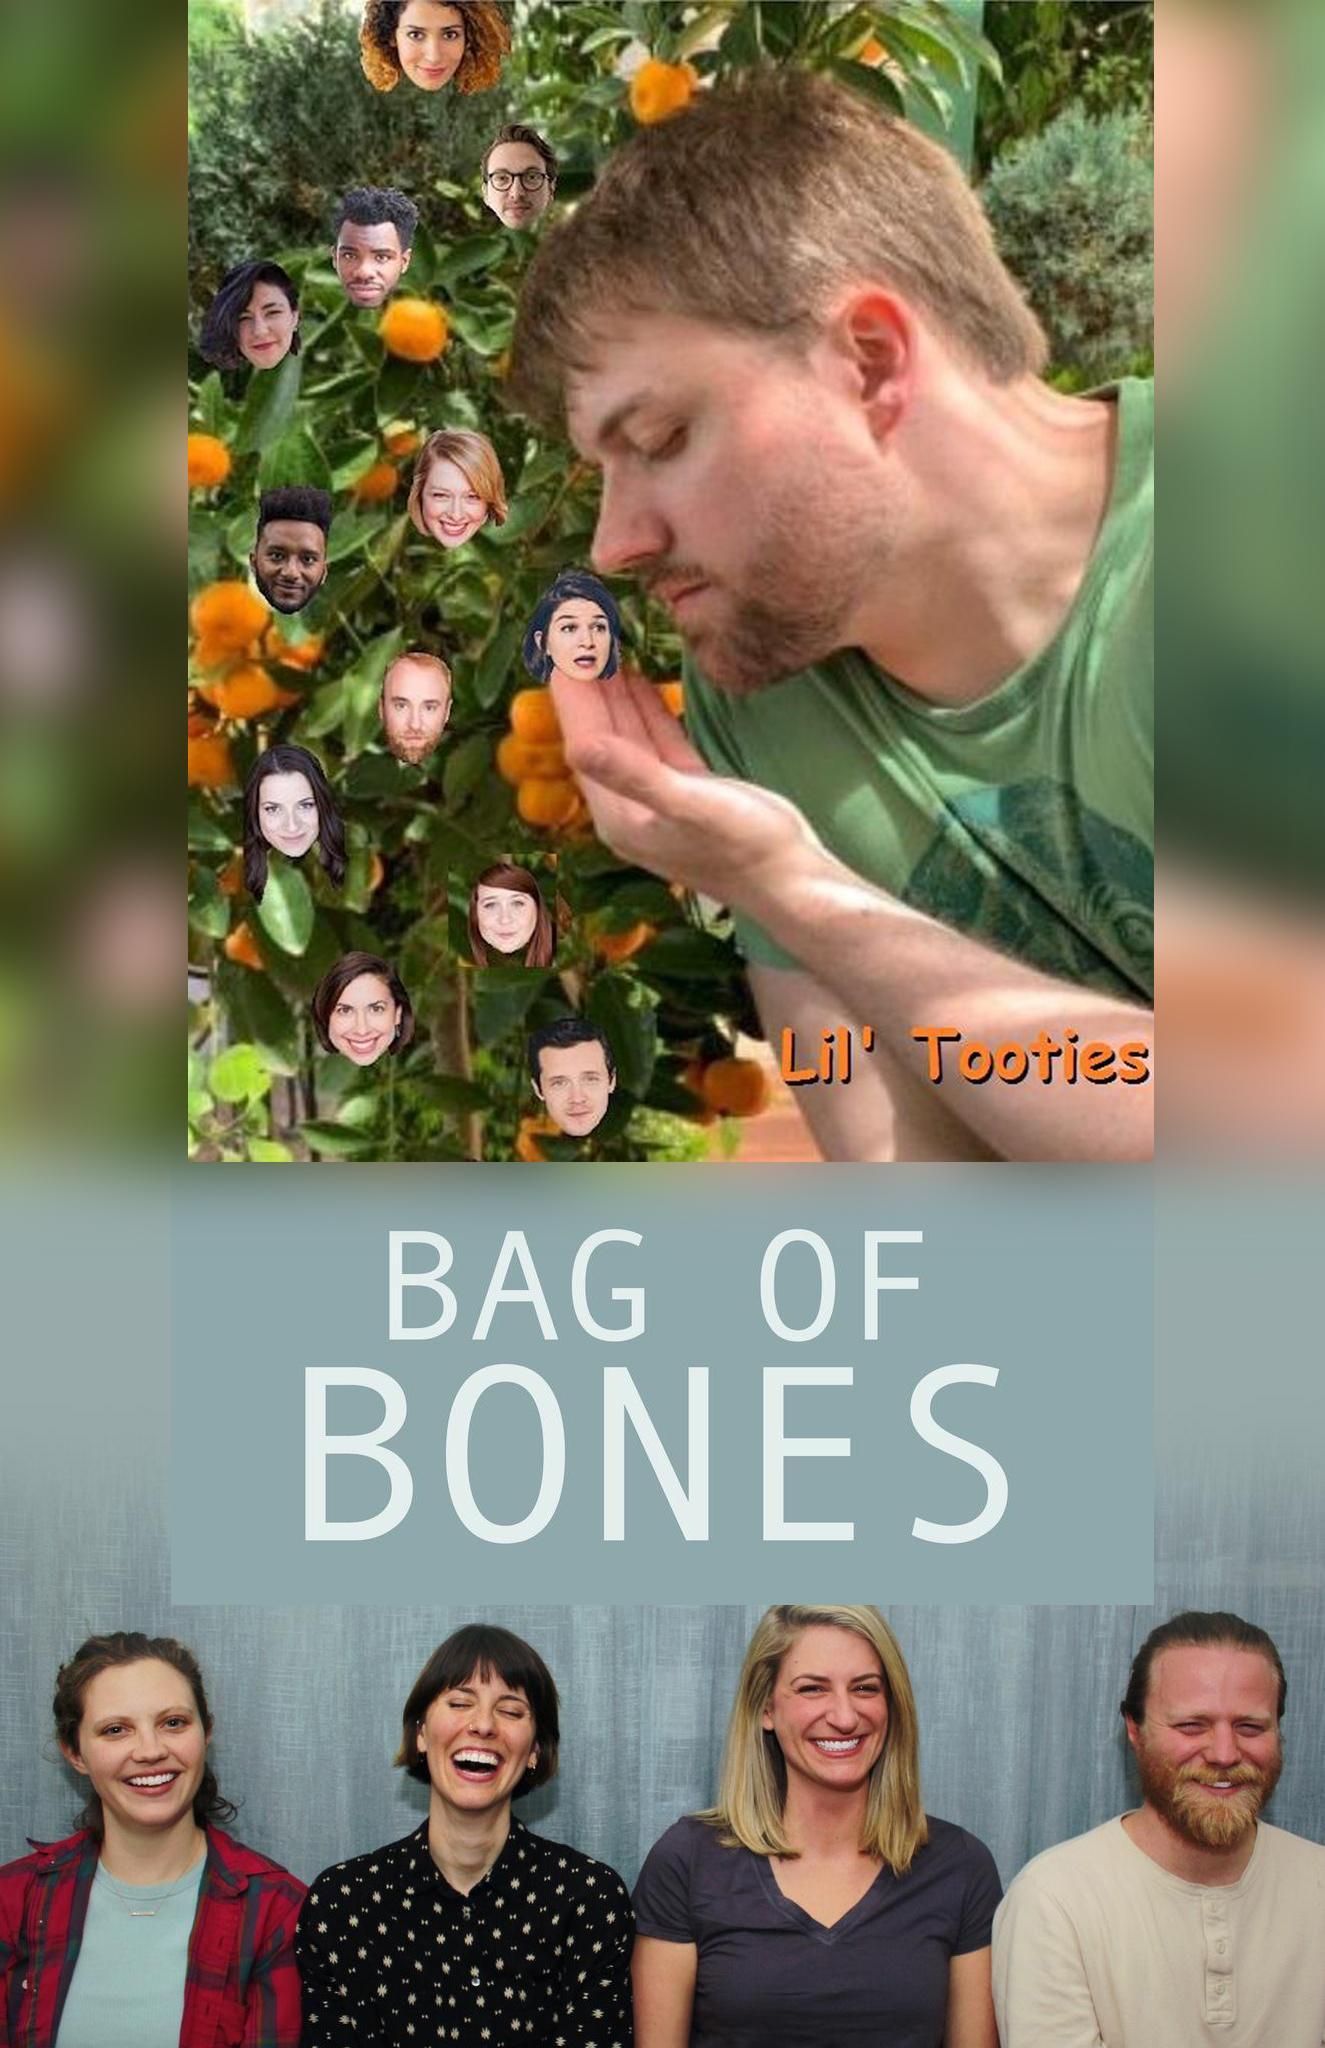 Lil' Tooties, Bag of Bones